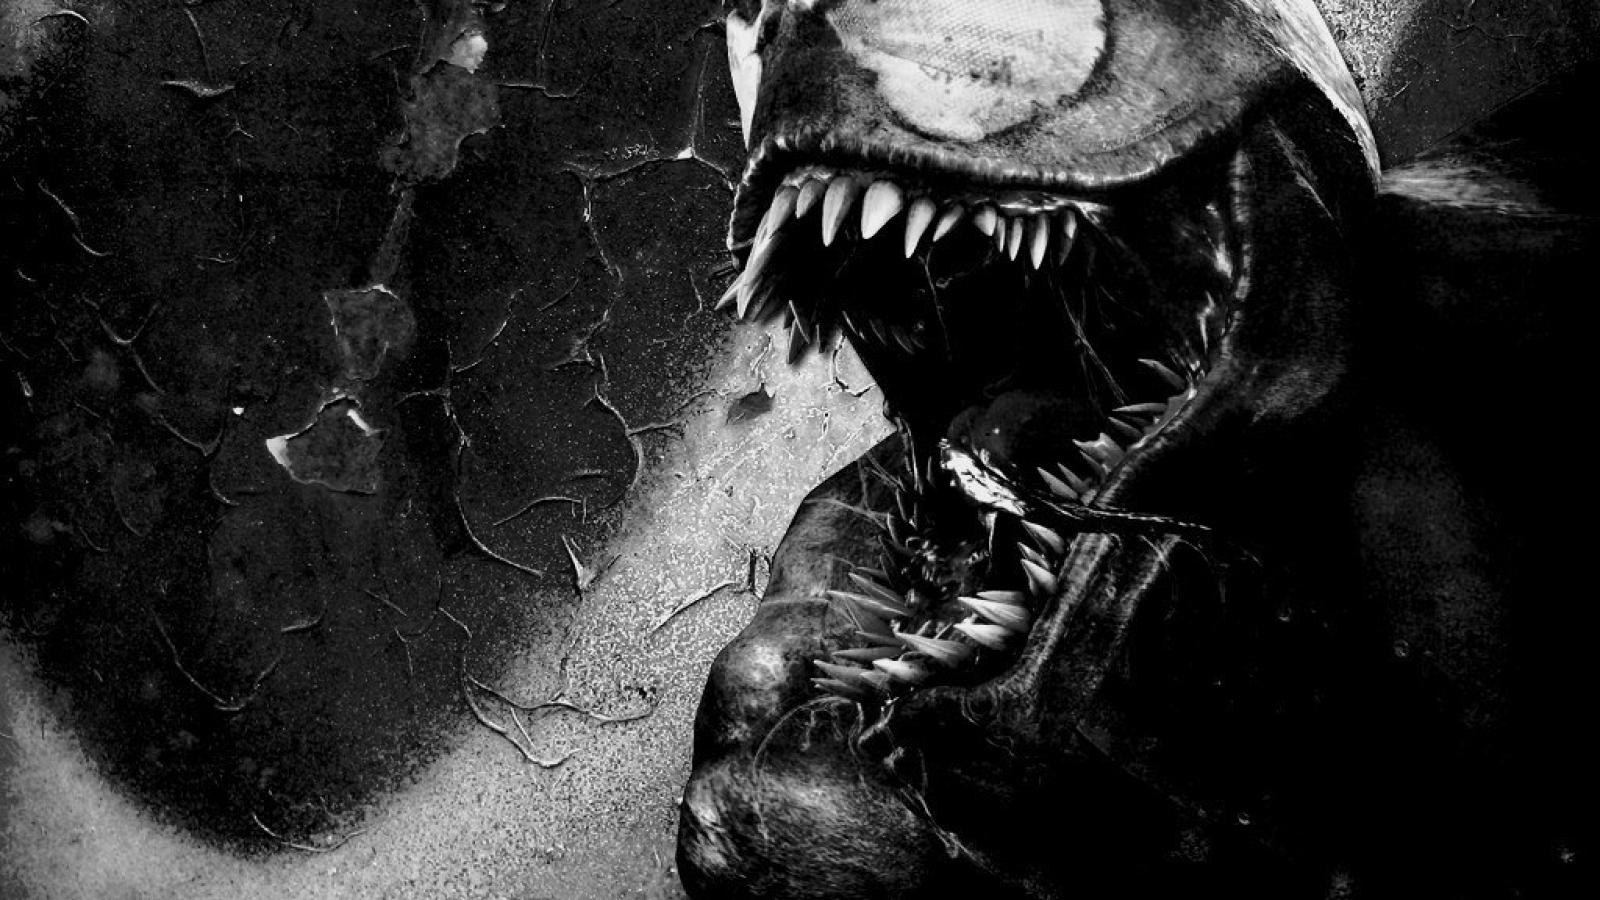 venom cool monochrome video games HD Wallpaper wallpaper   19   HQ 1600x900